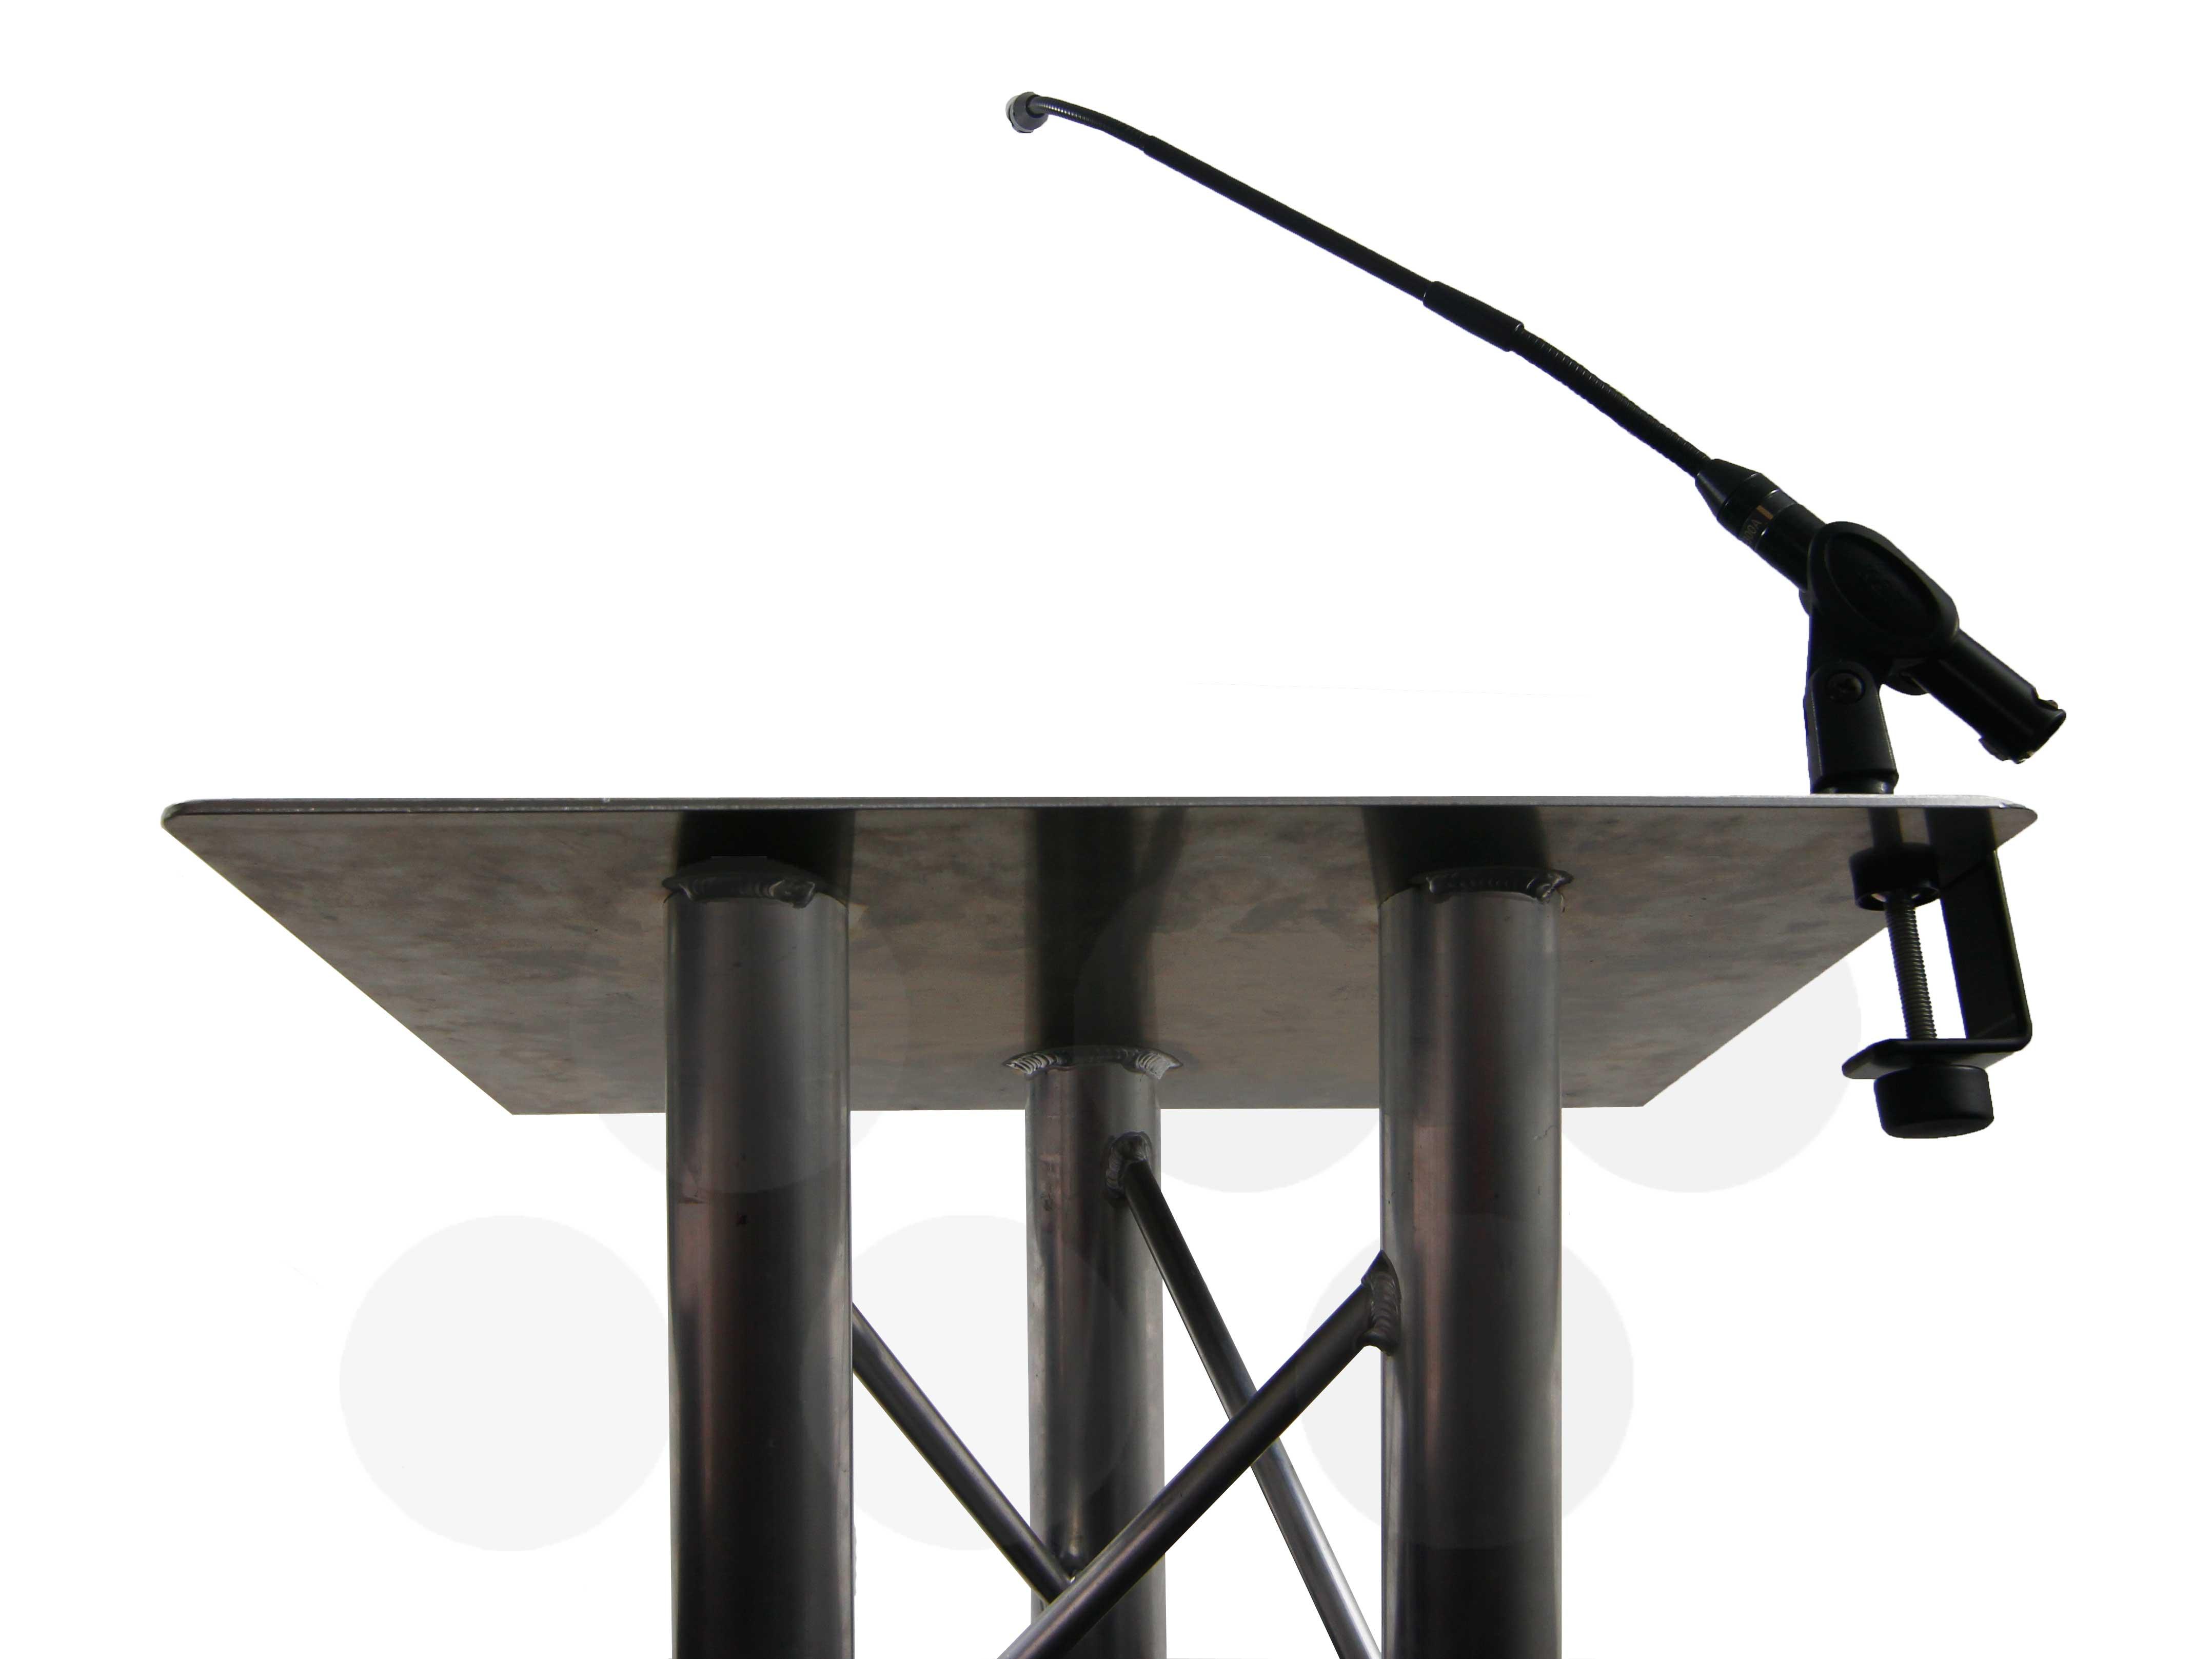 CrownLM300 Gooseneck Microphone